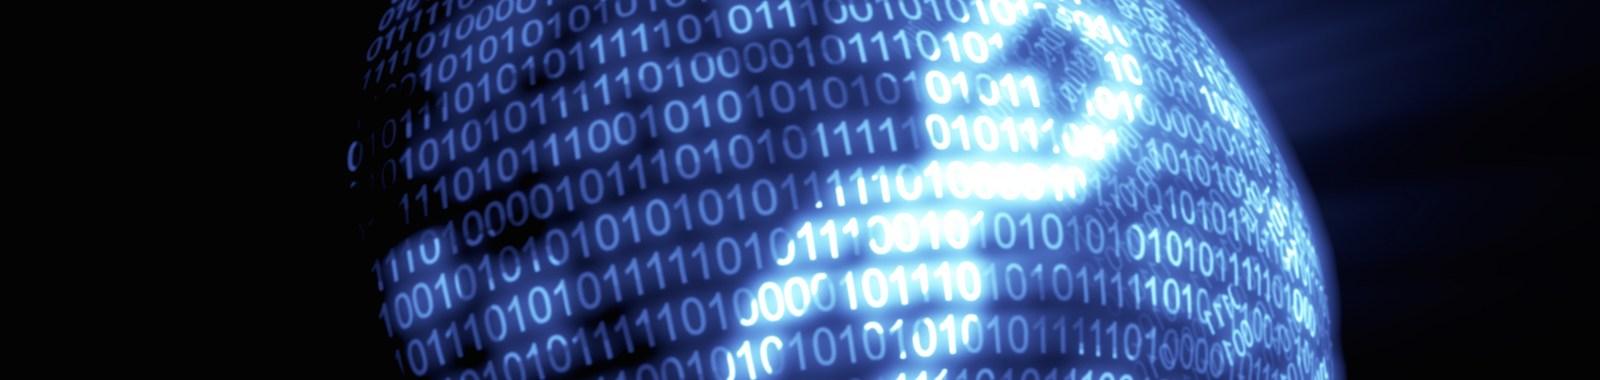 Digital Blue Binary Code Technology